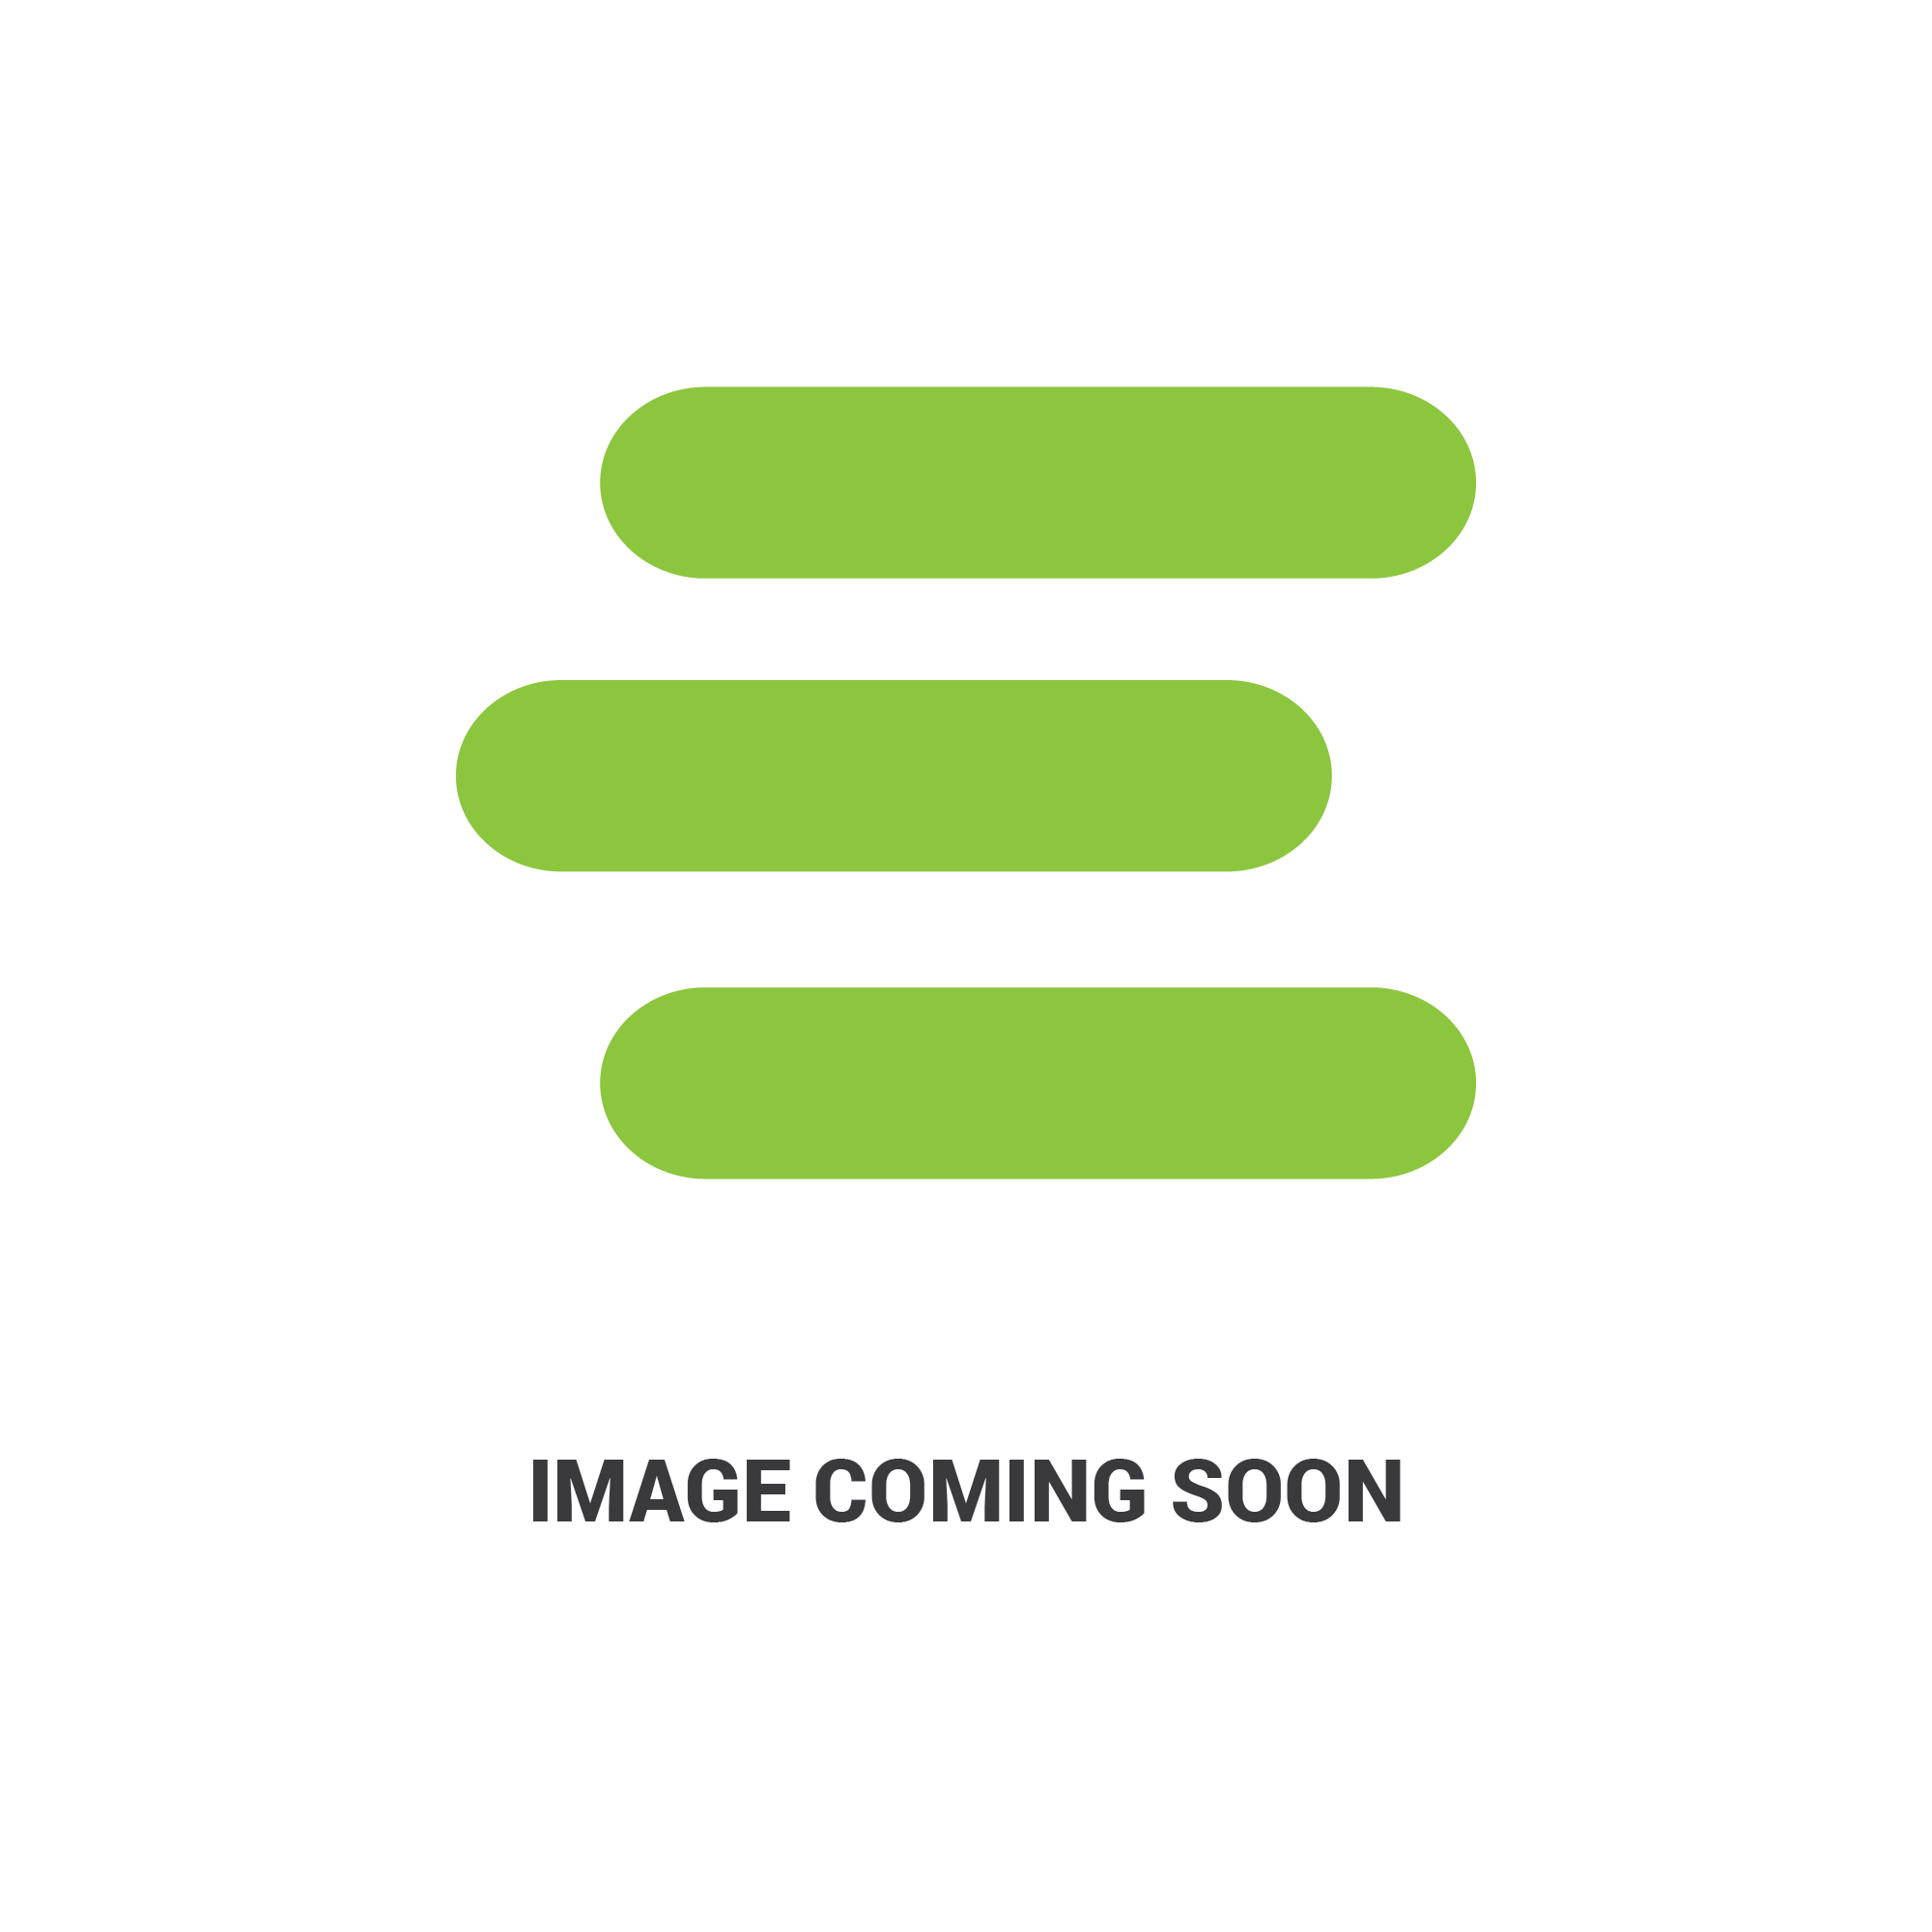 E-310030edit 1.jpg